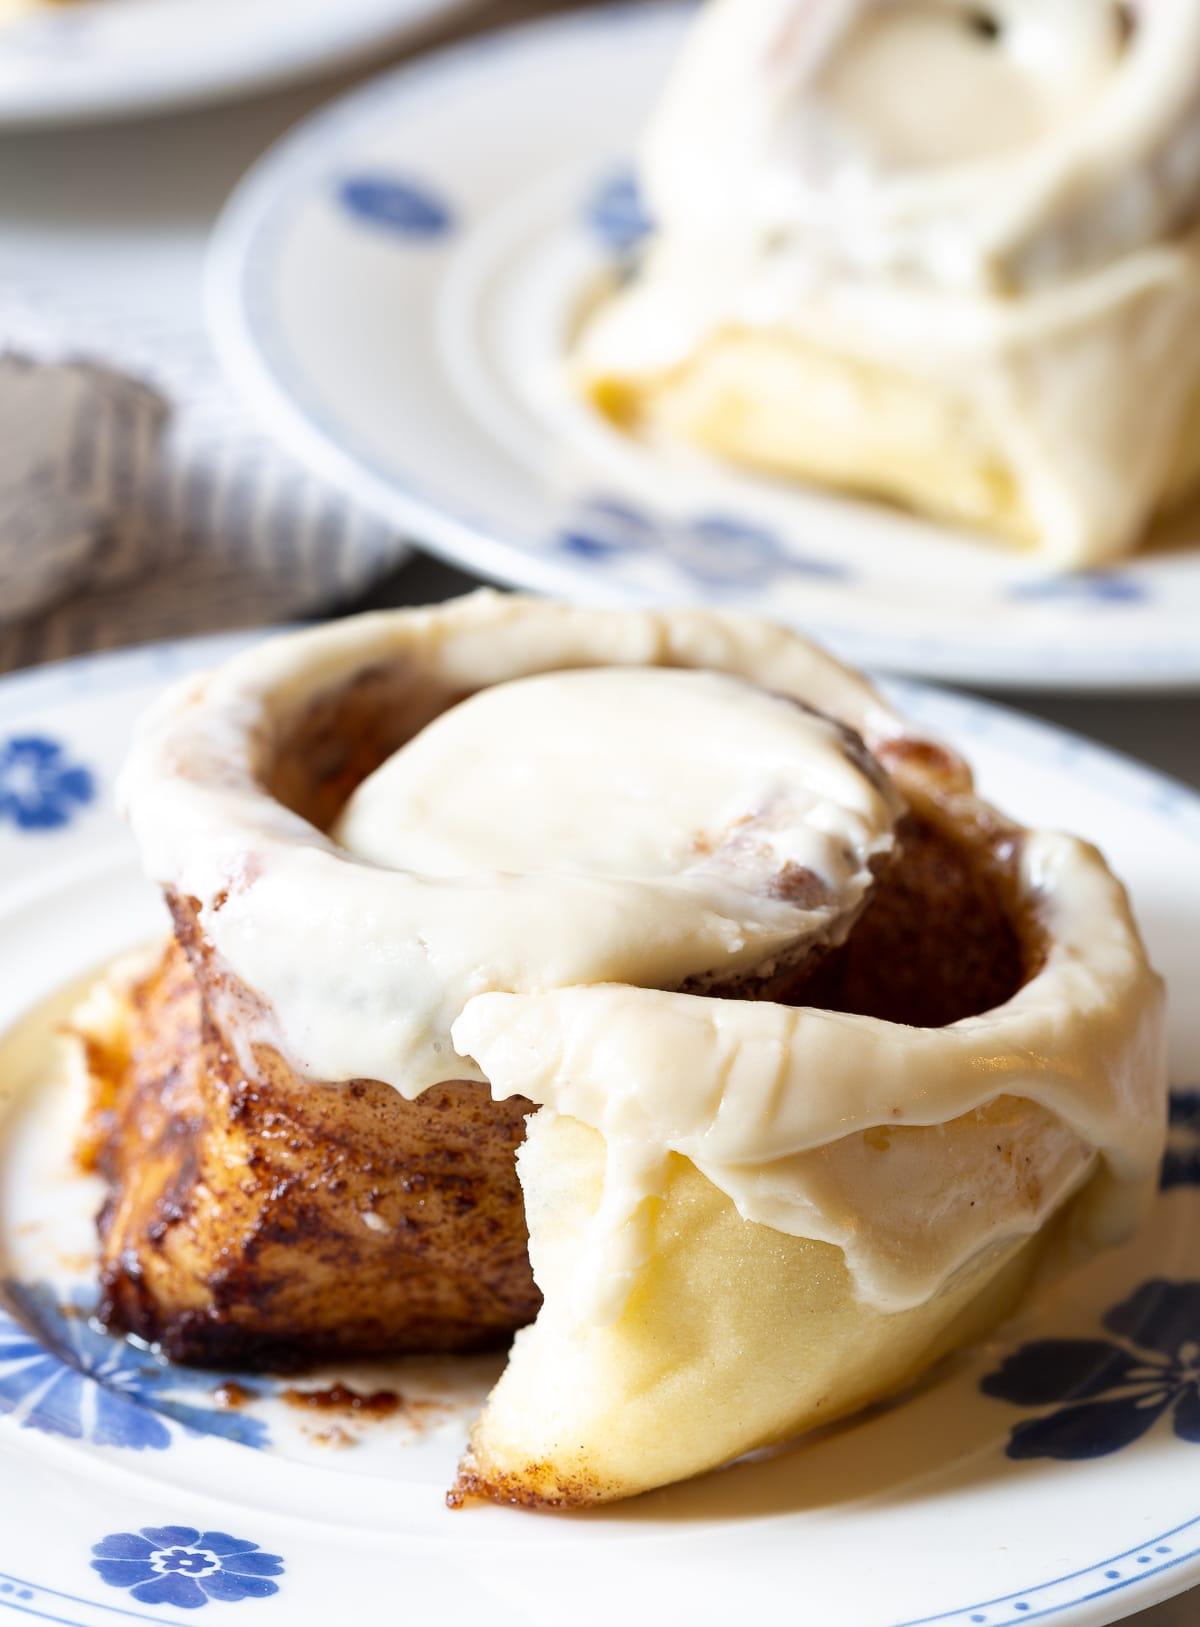 """Better than Cinnabon"" Cinnamon Rolls Recipe #ASpicyPerspective #CinnamonRolls #CinnamonRollRecipe #HowtoMakeCinnamonRolls #Cinnabon #Dessert #Breakfast #Cinnamon #Homemade"